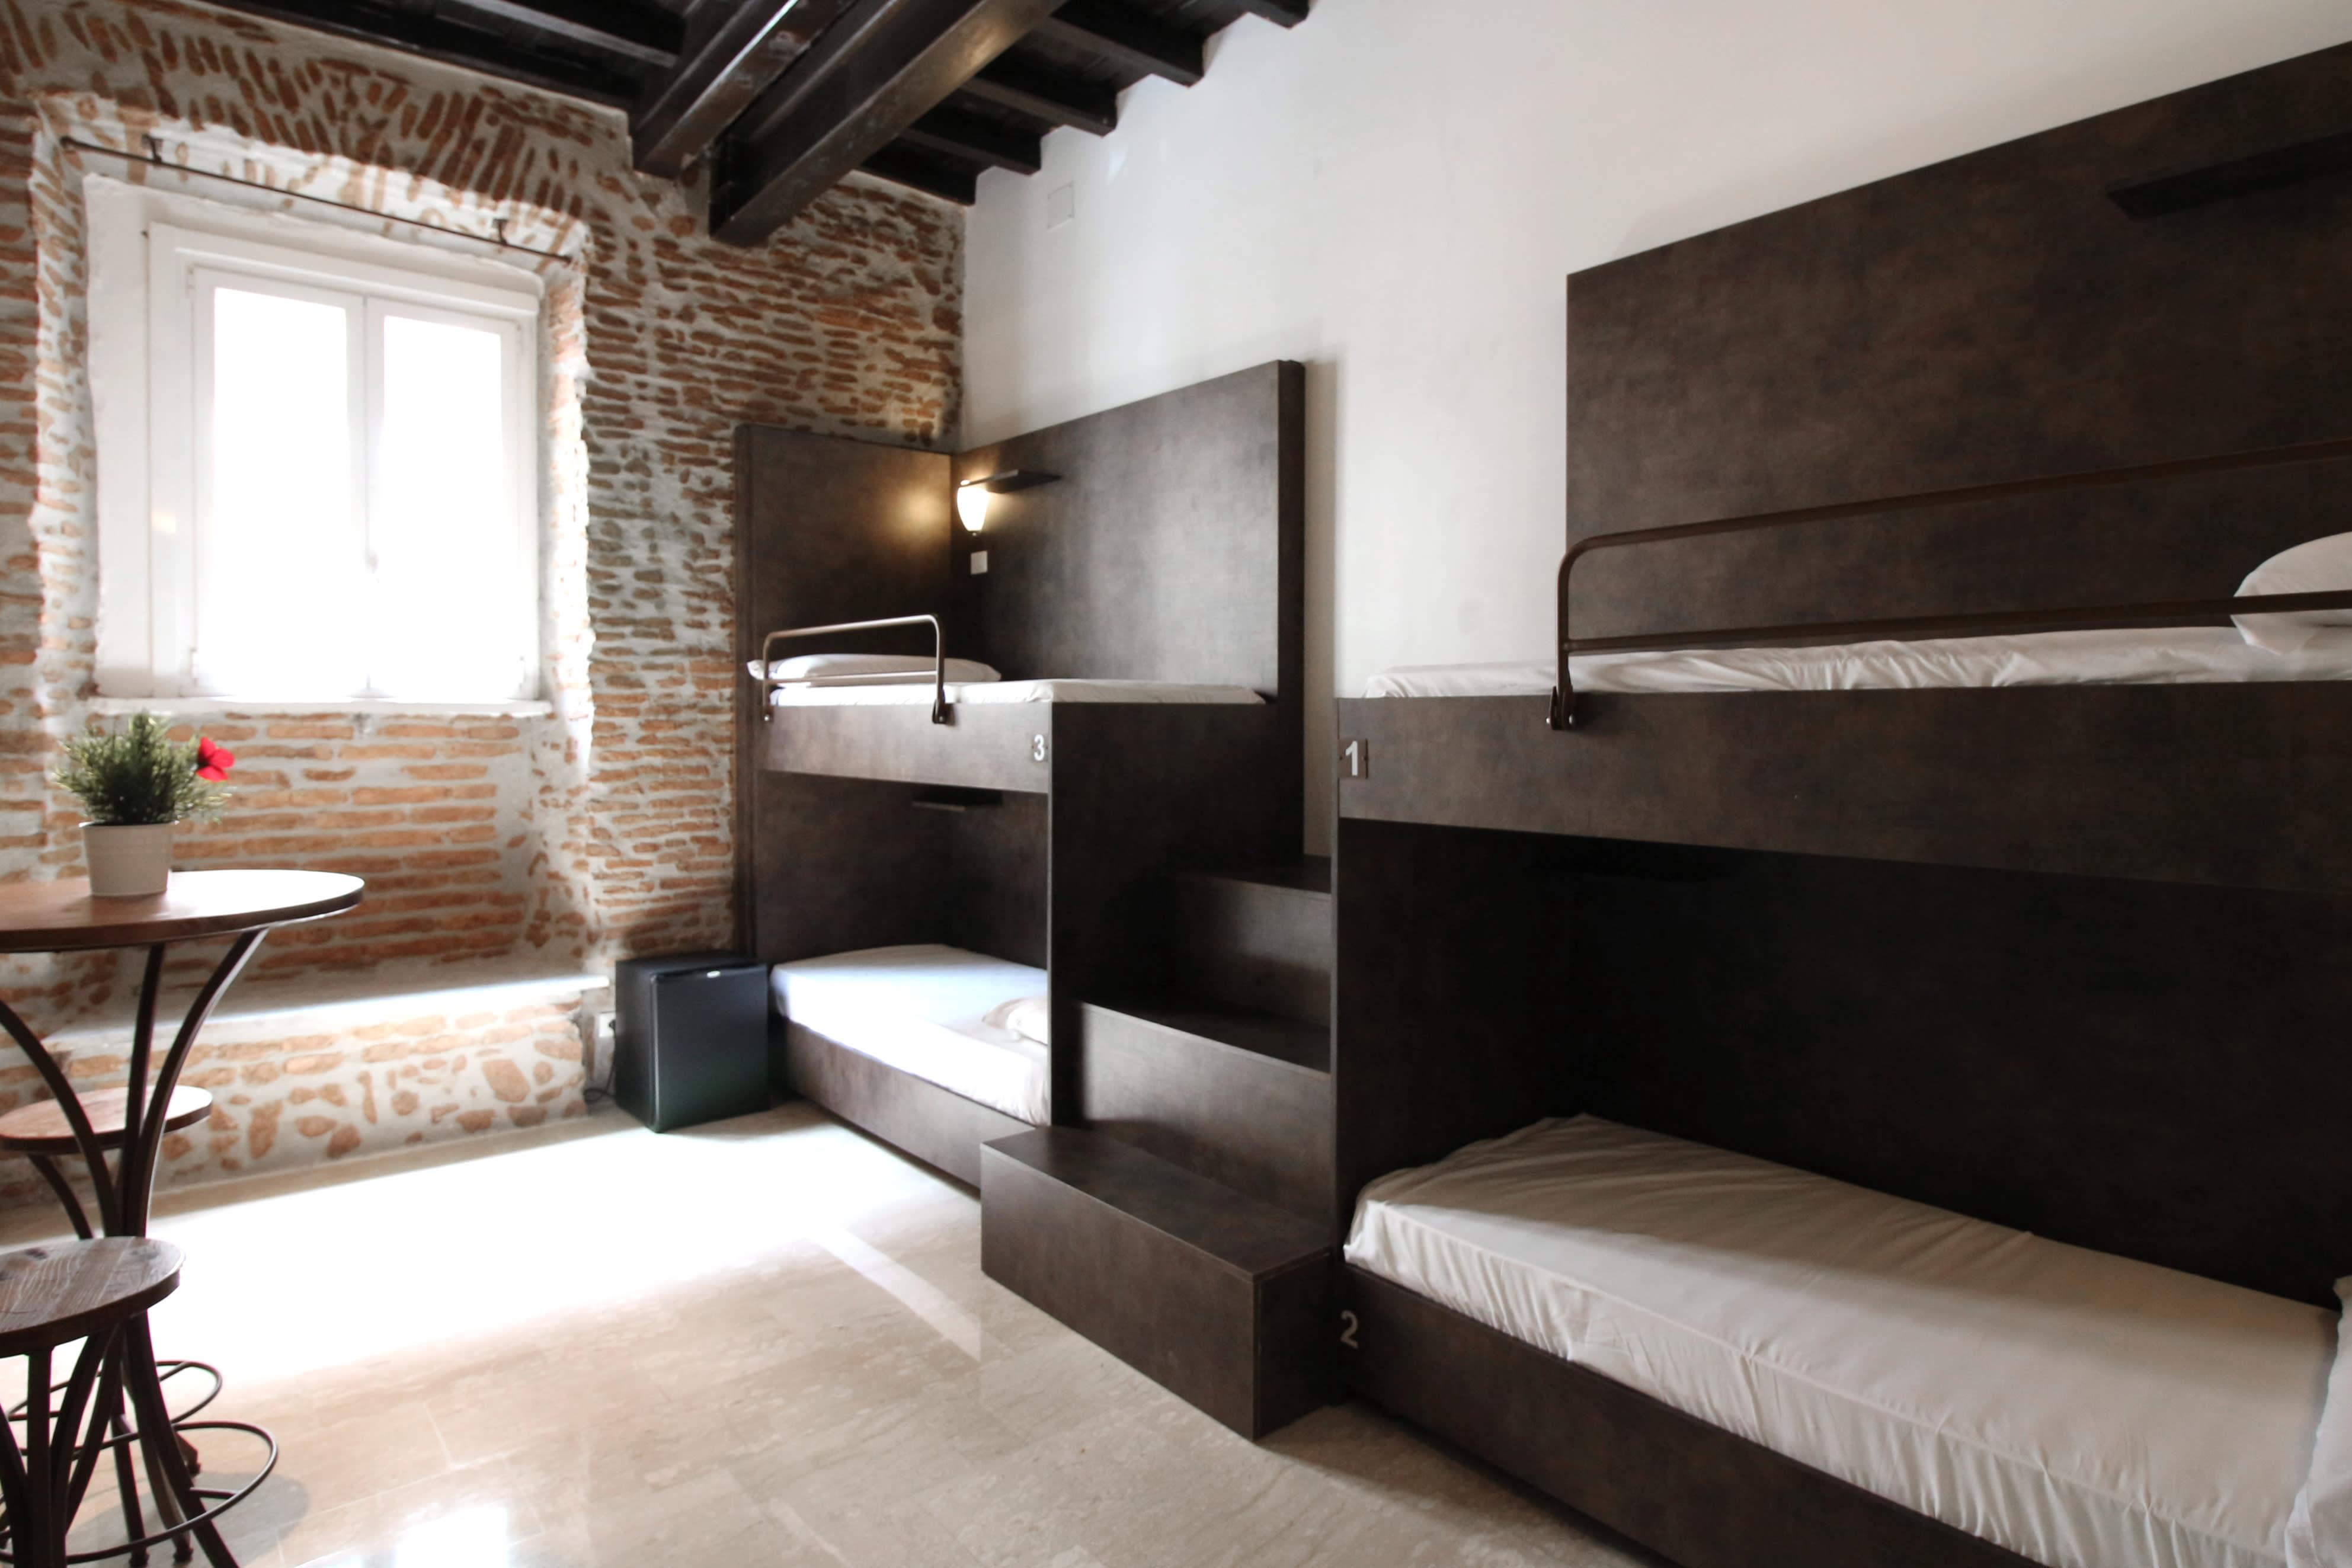 HOSTEL - New Generation Hostel Santa Maria Maggiore